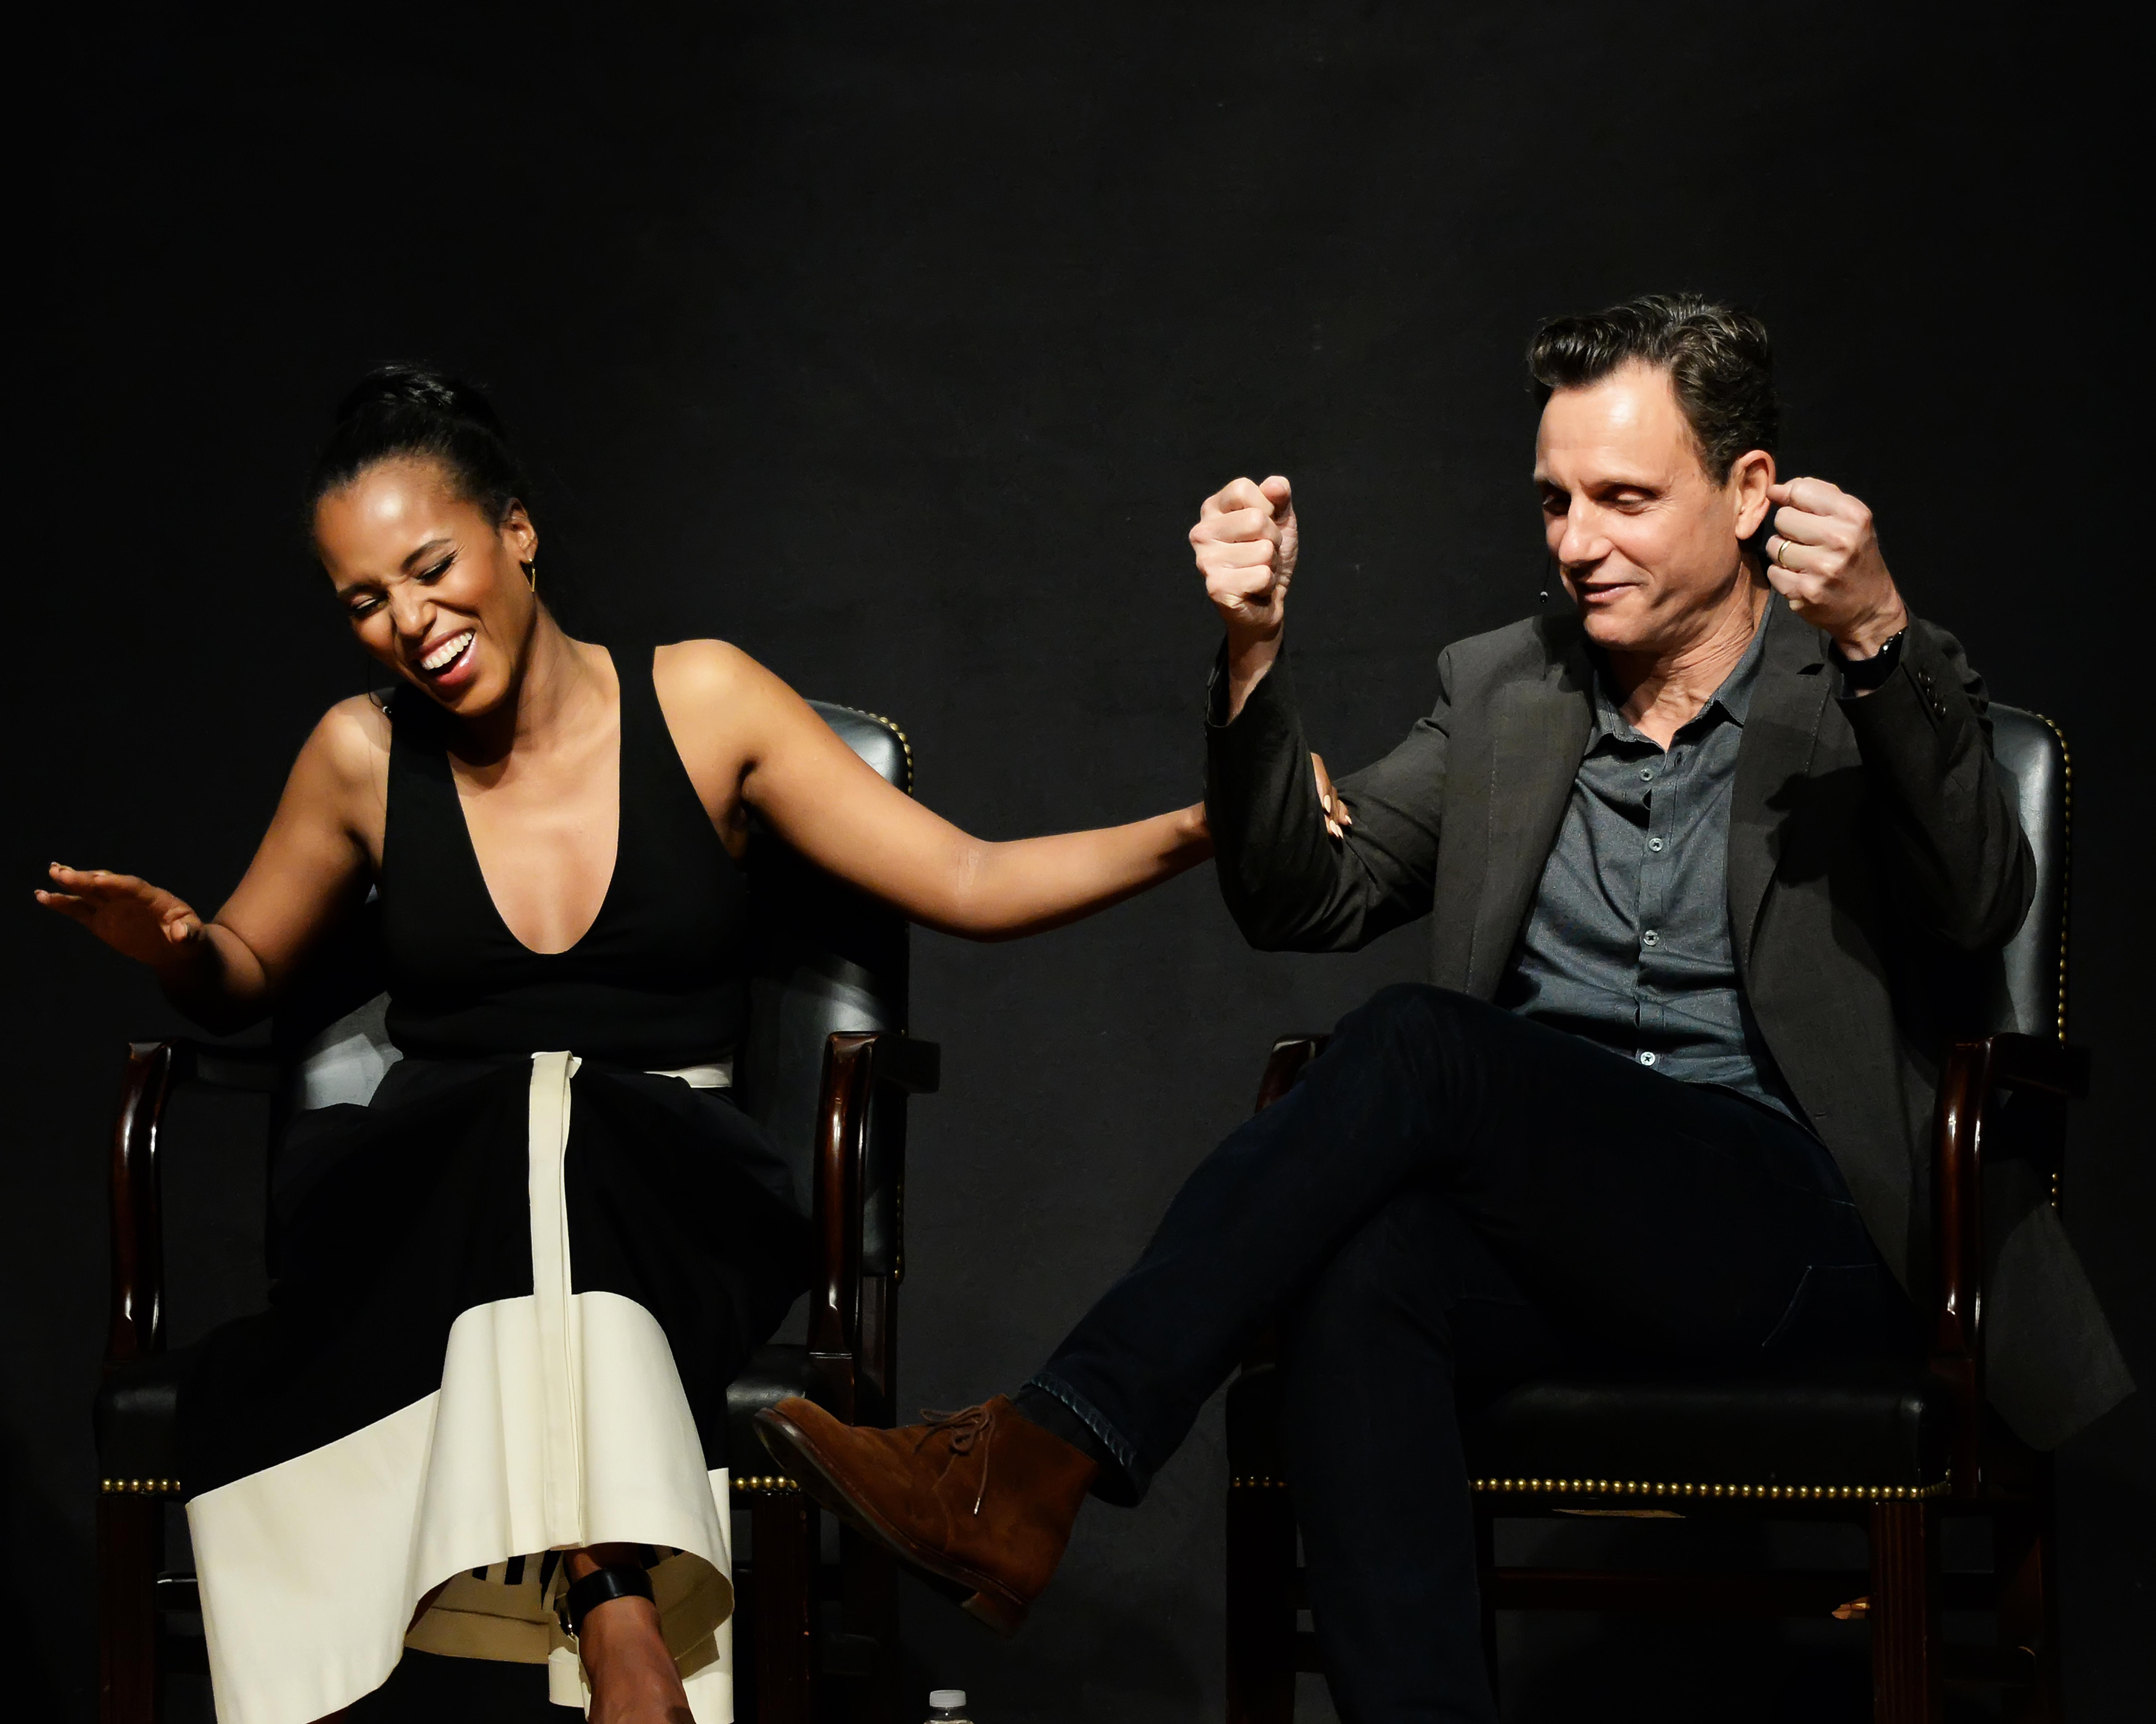 'Scandal' stars, creator discuss real vs. fictional DC